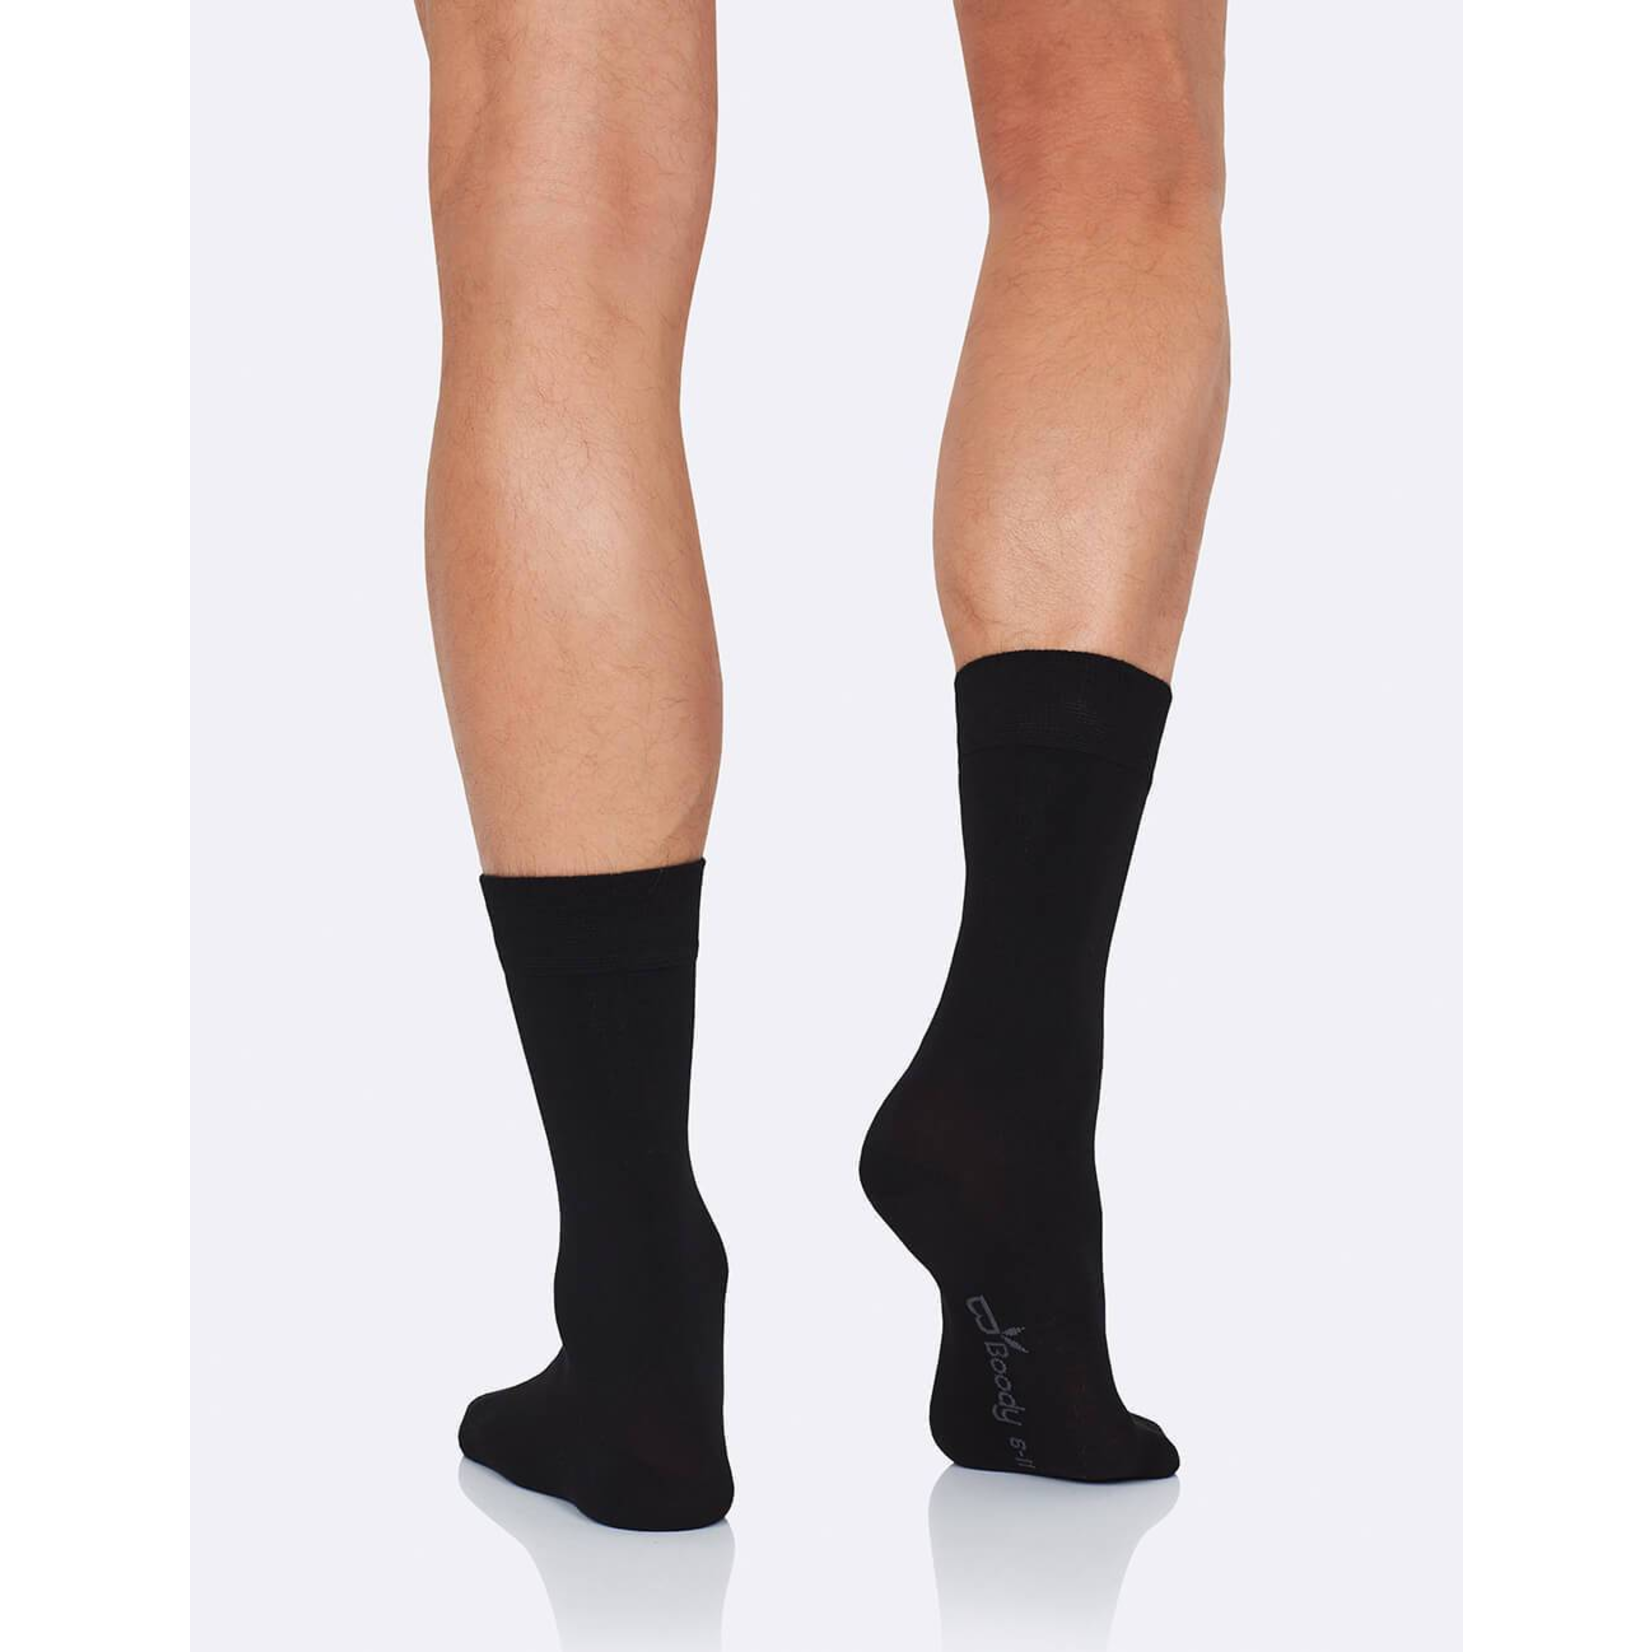 Boody Boody Men's Business Socks Black